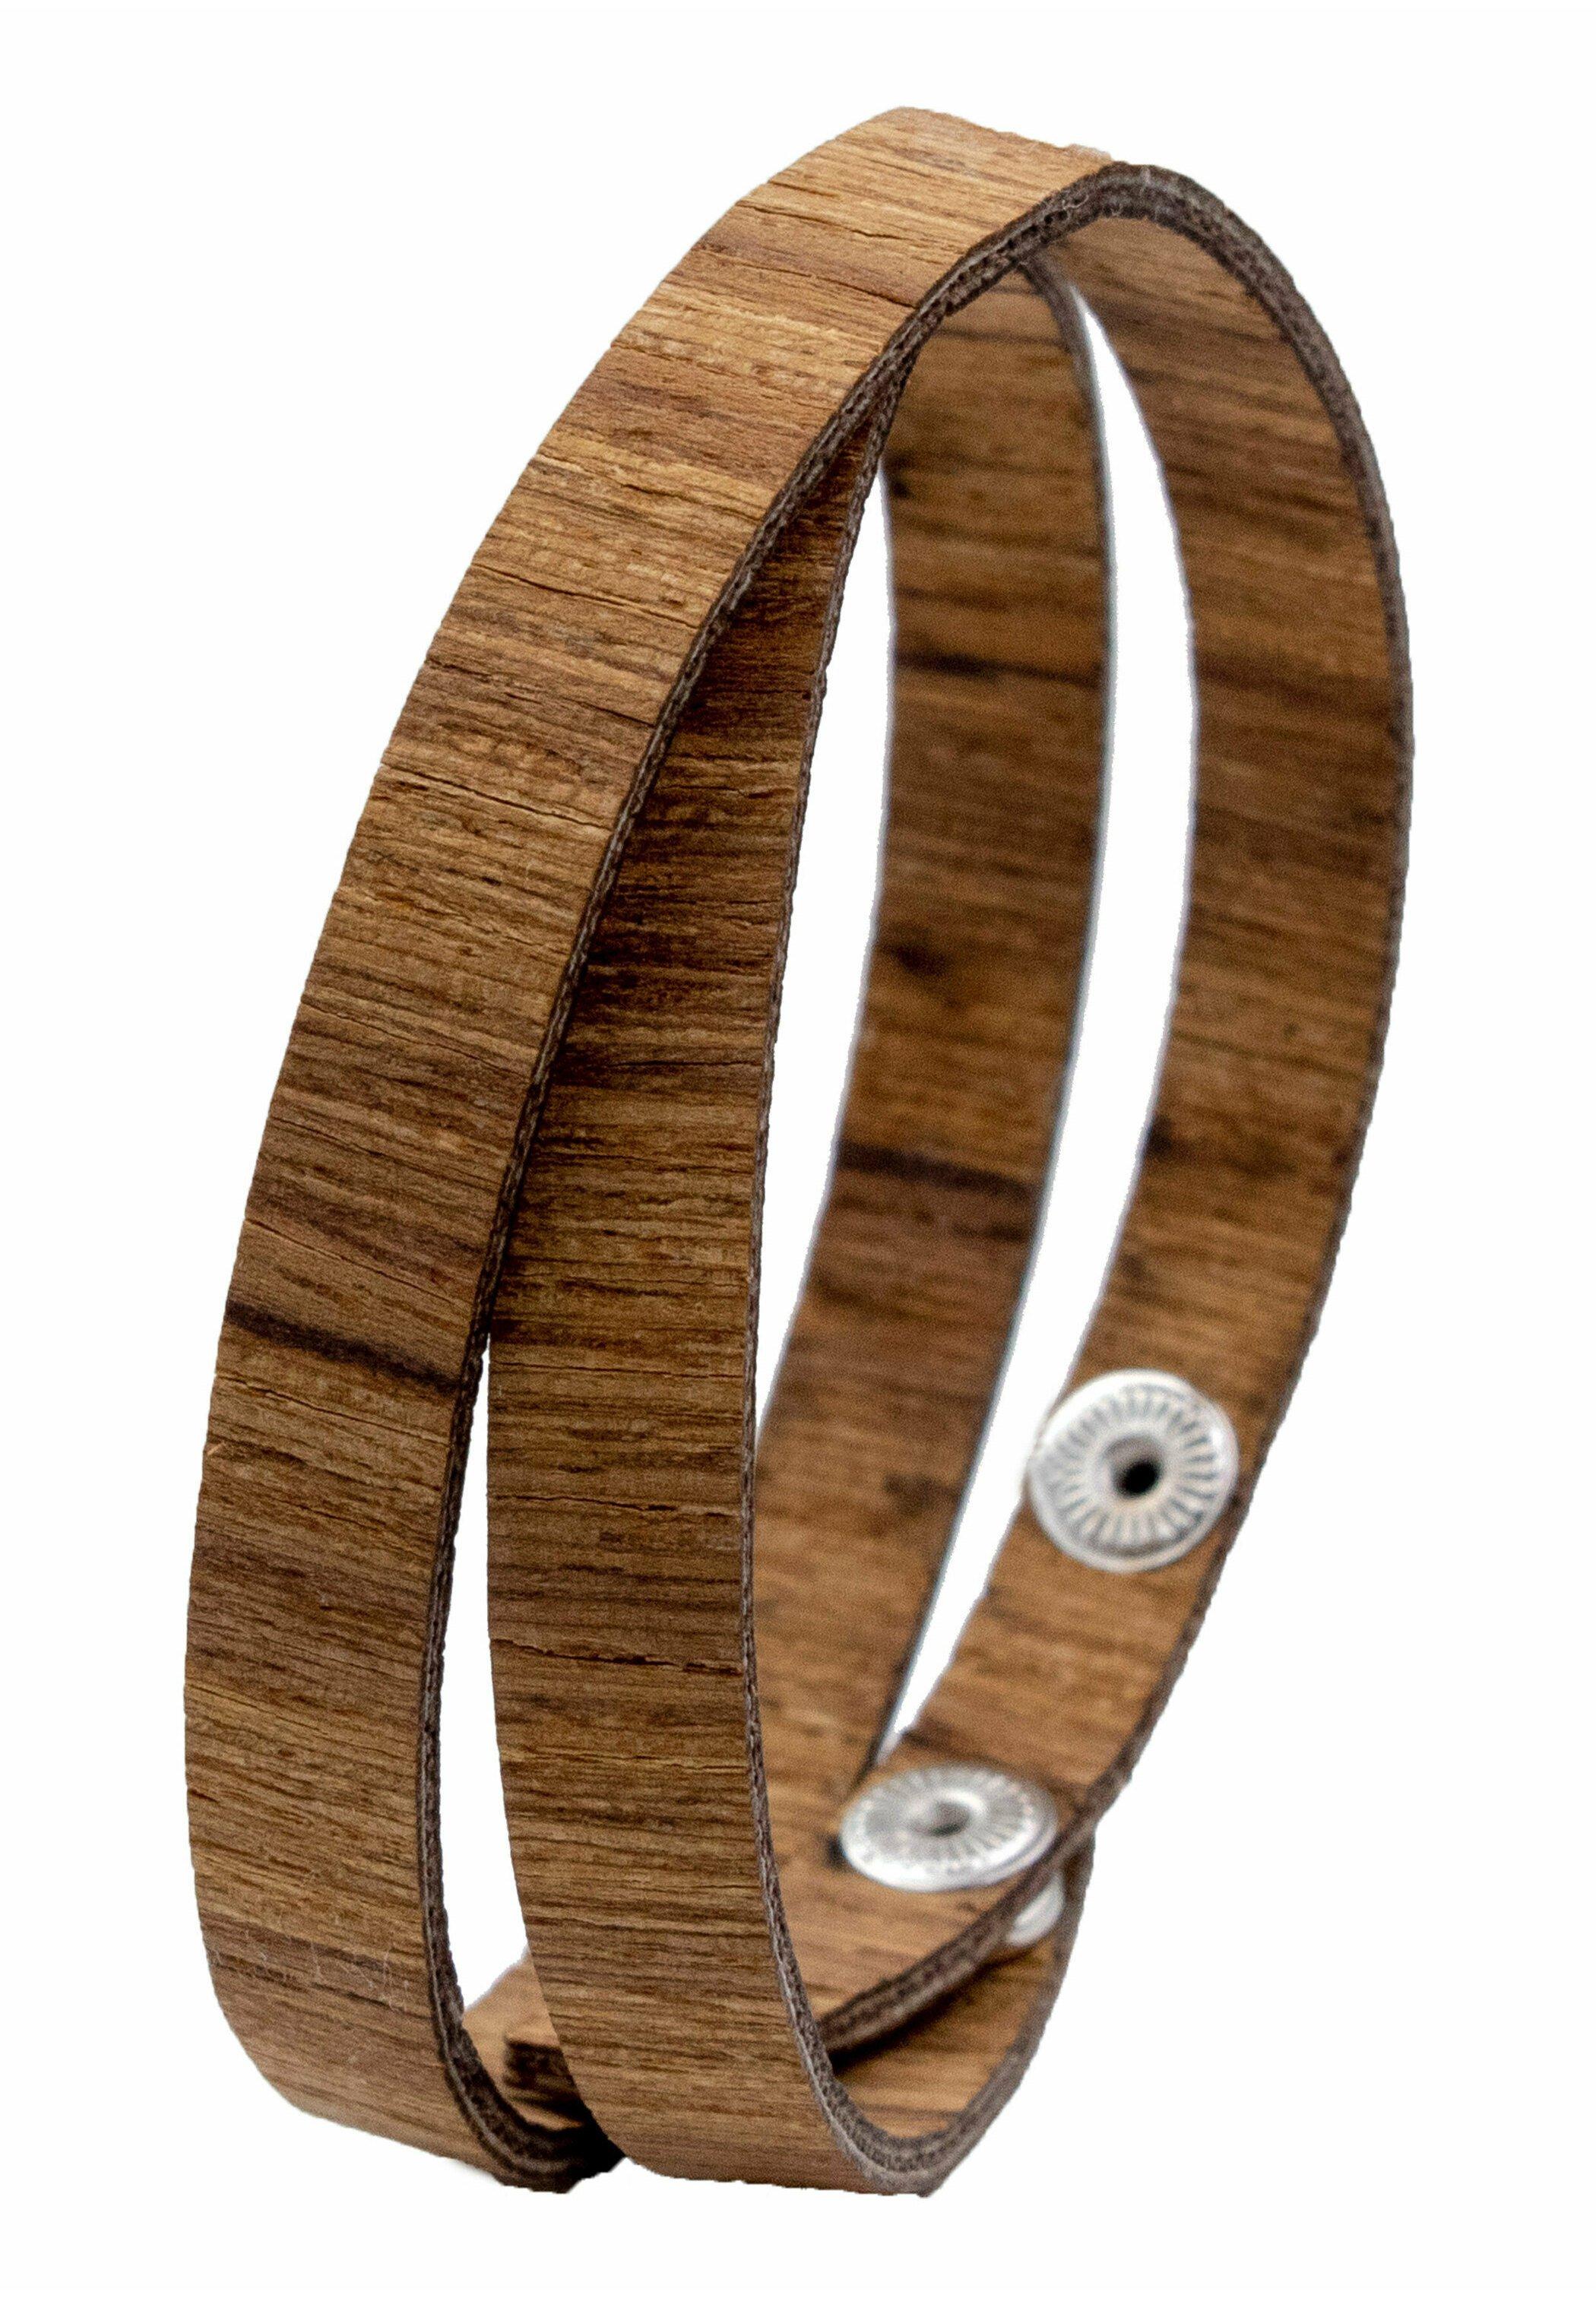 Homme LAIMER WICKEL-ARMBAND AUS TEAKHOLZ - S1111 - Bracelet